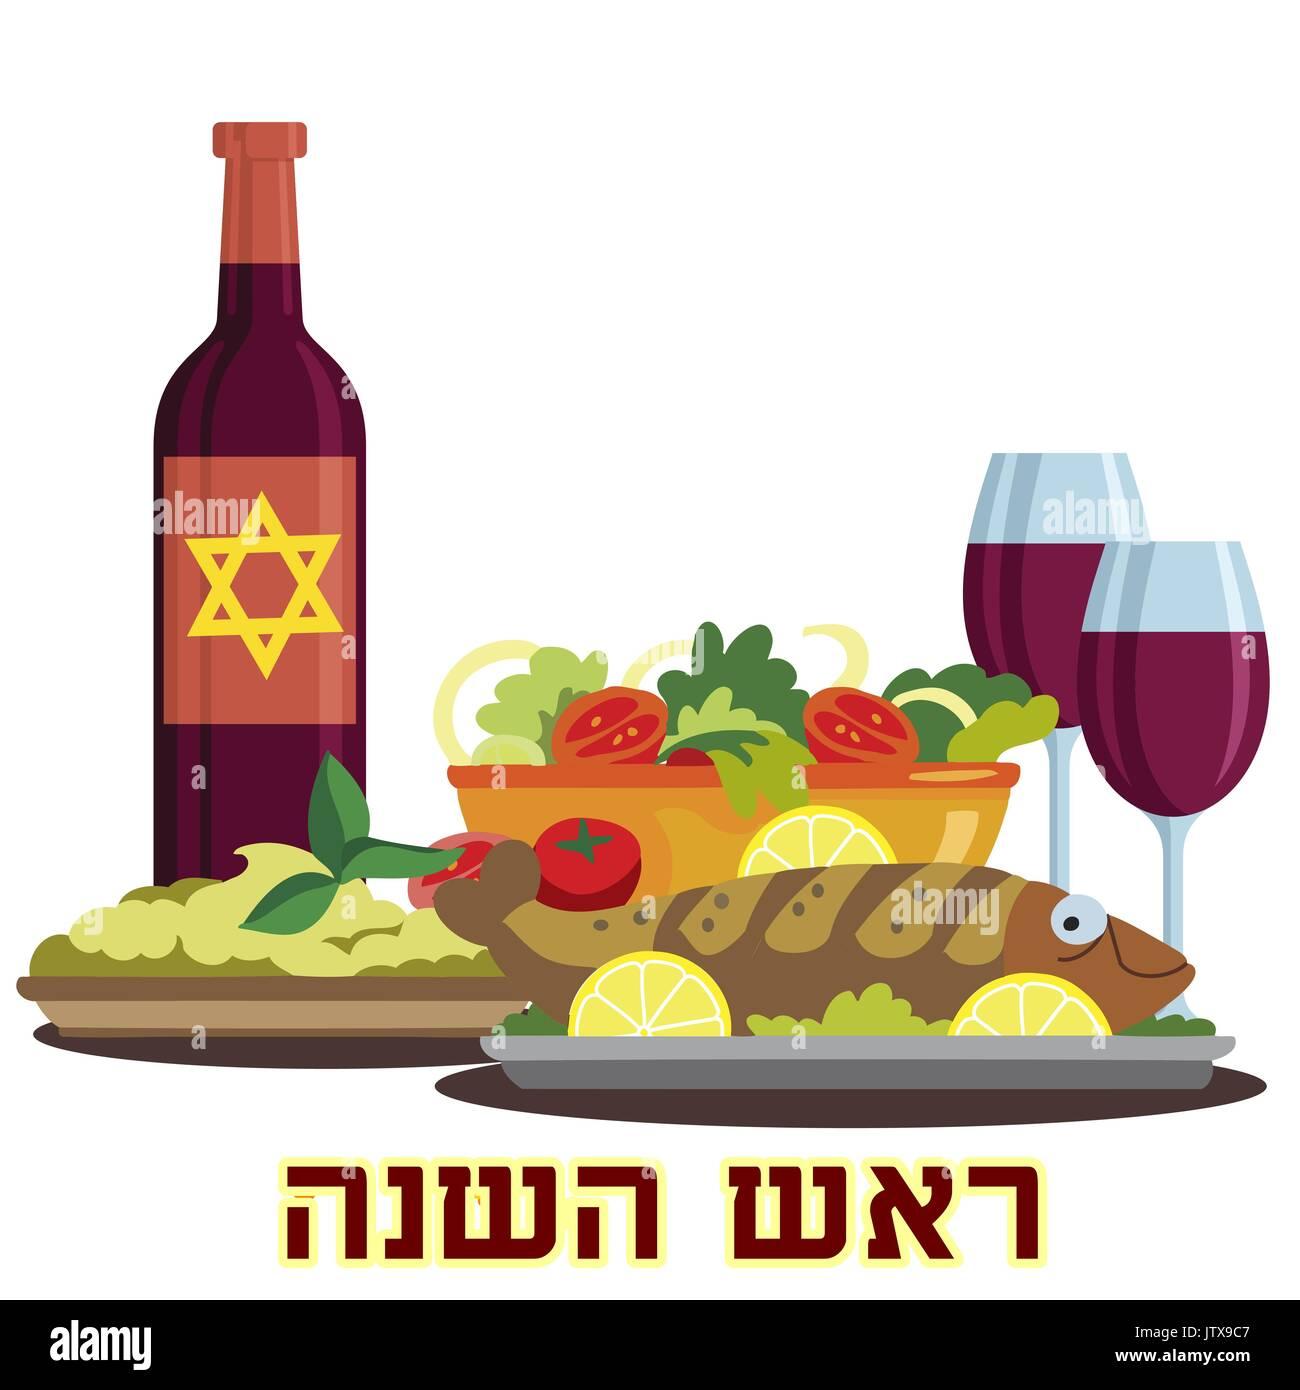 Jewish New Year or Rosh Hashanah in 2019 56